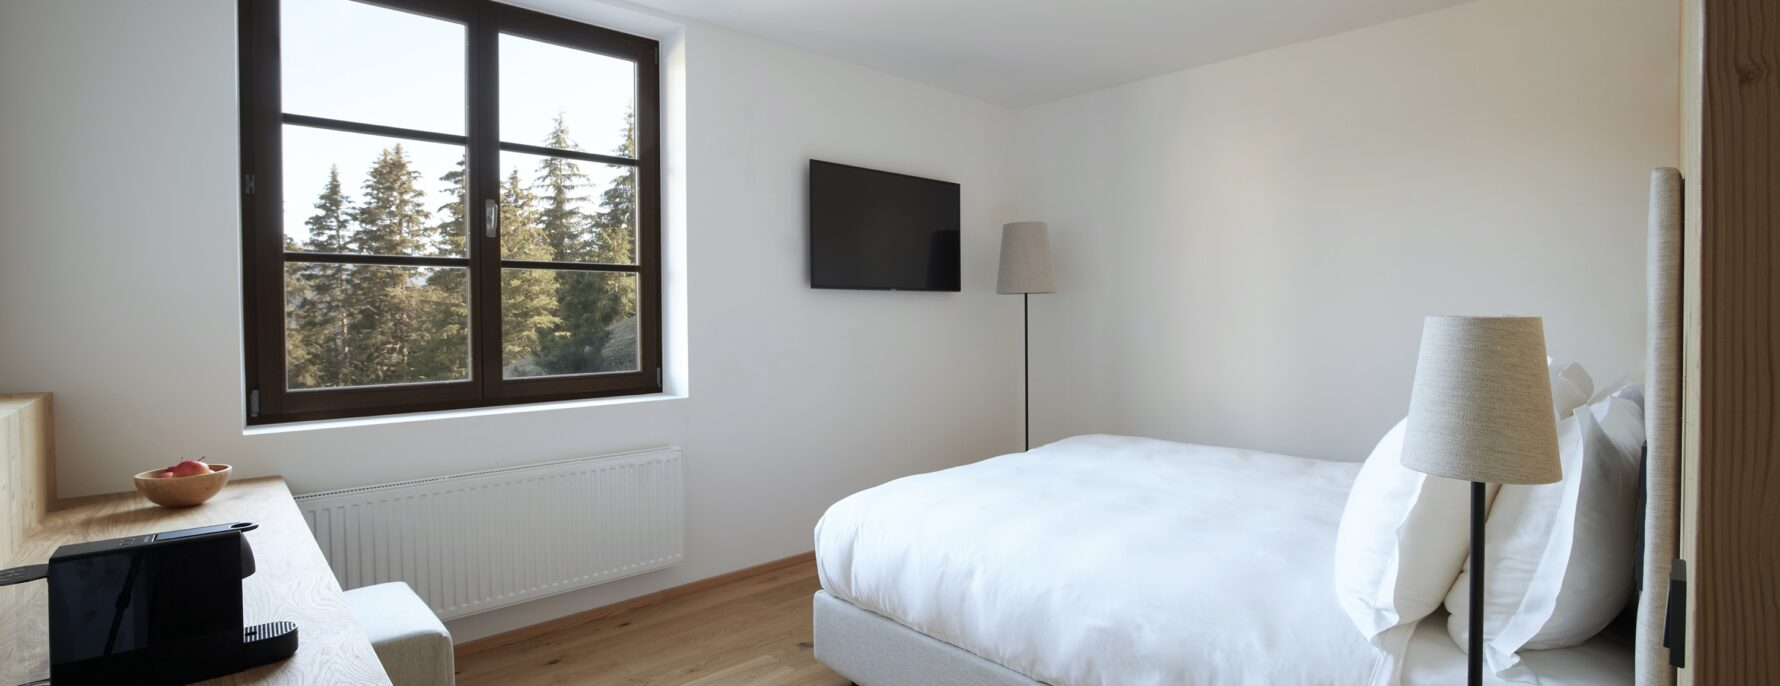 Nest Italy: Mountain Room